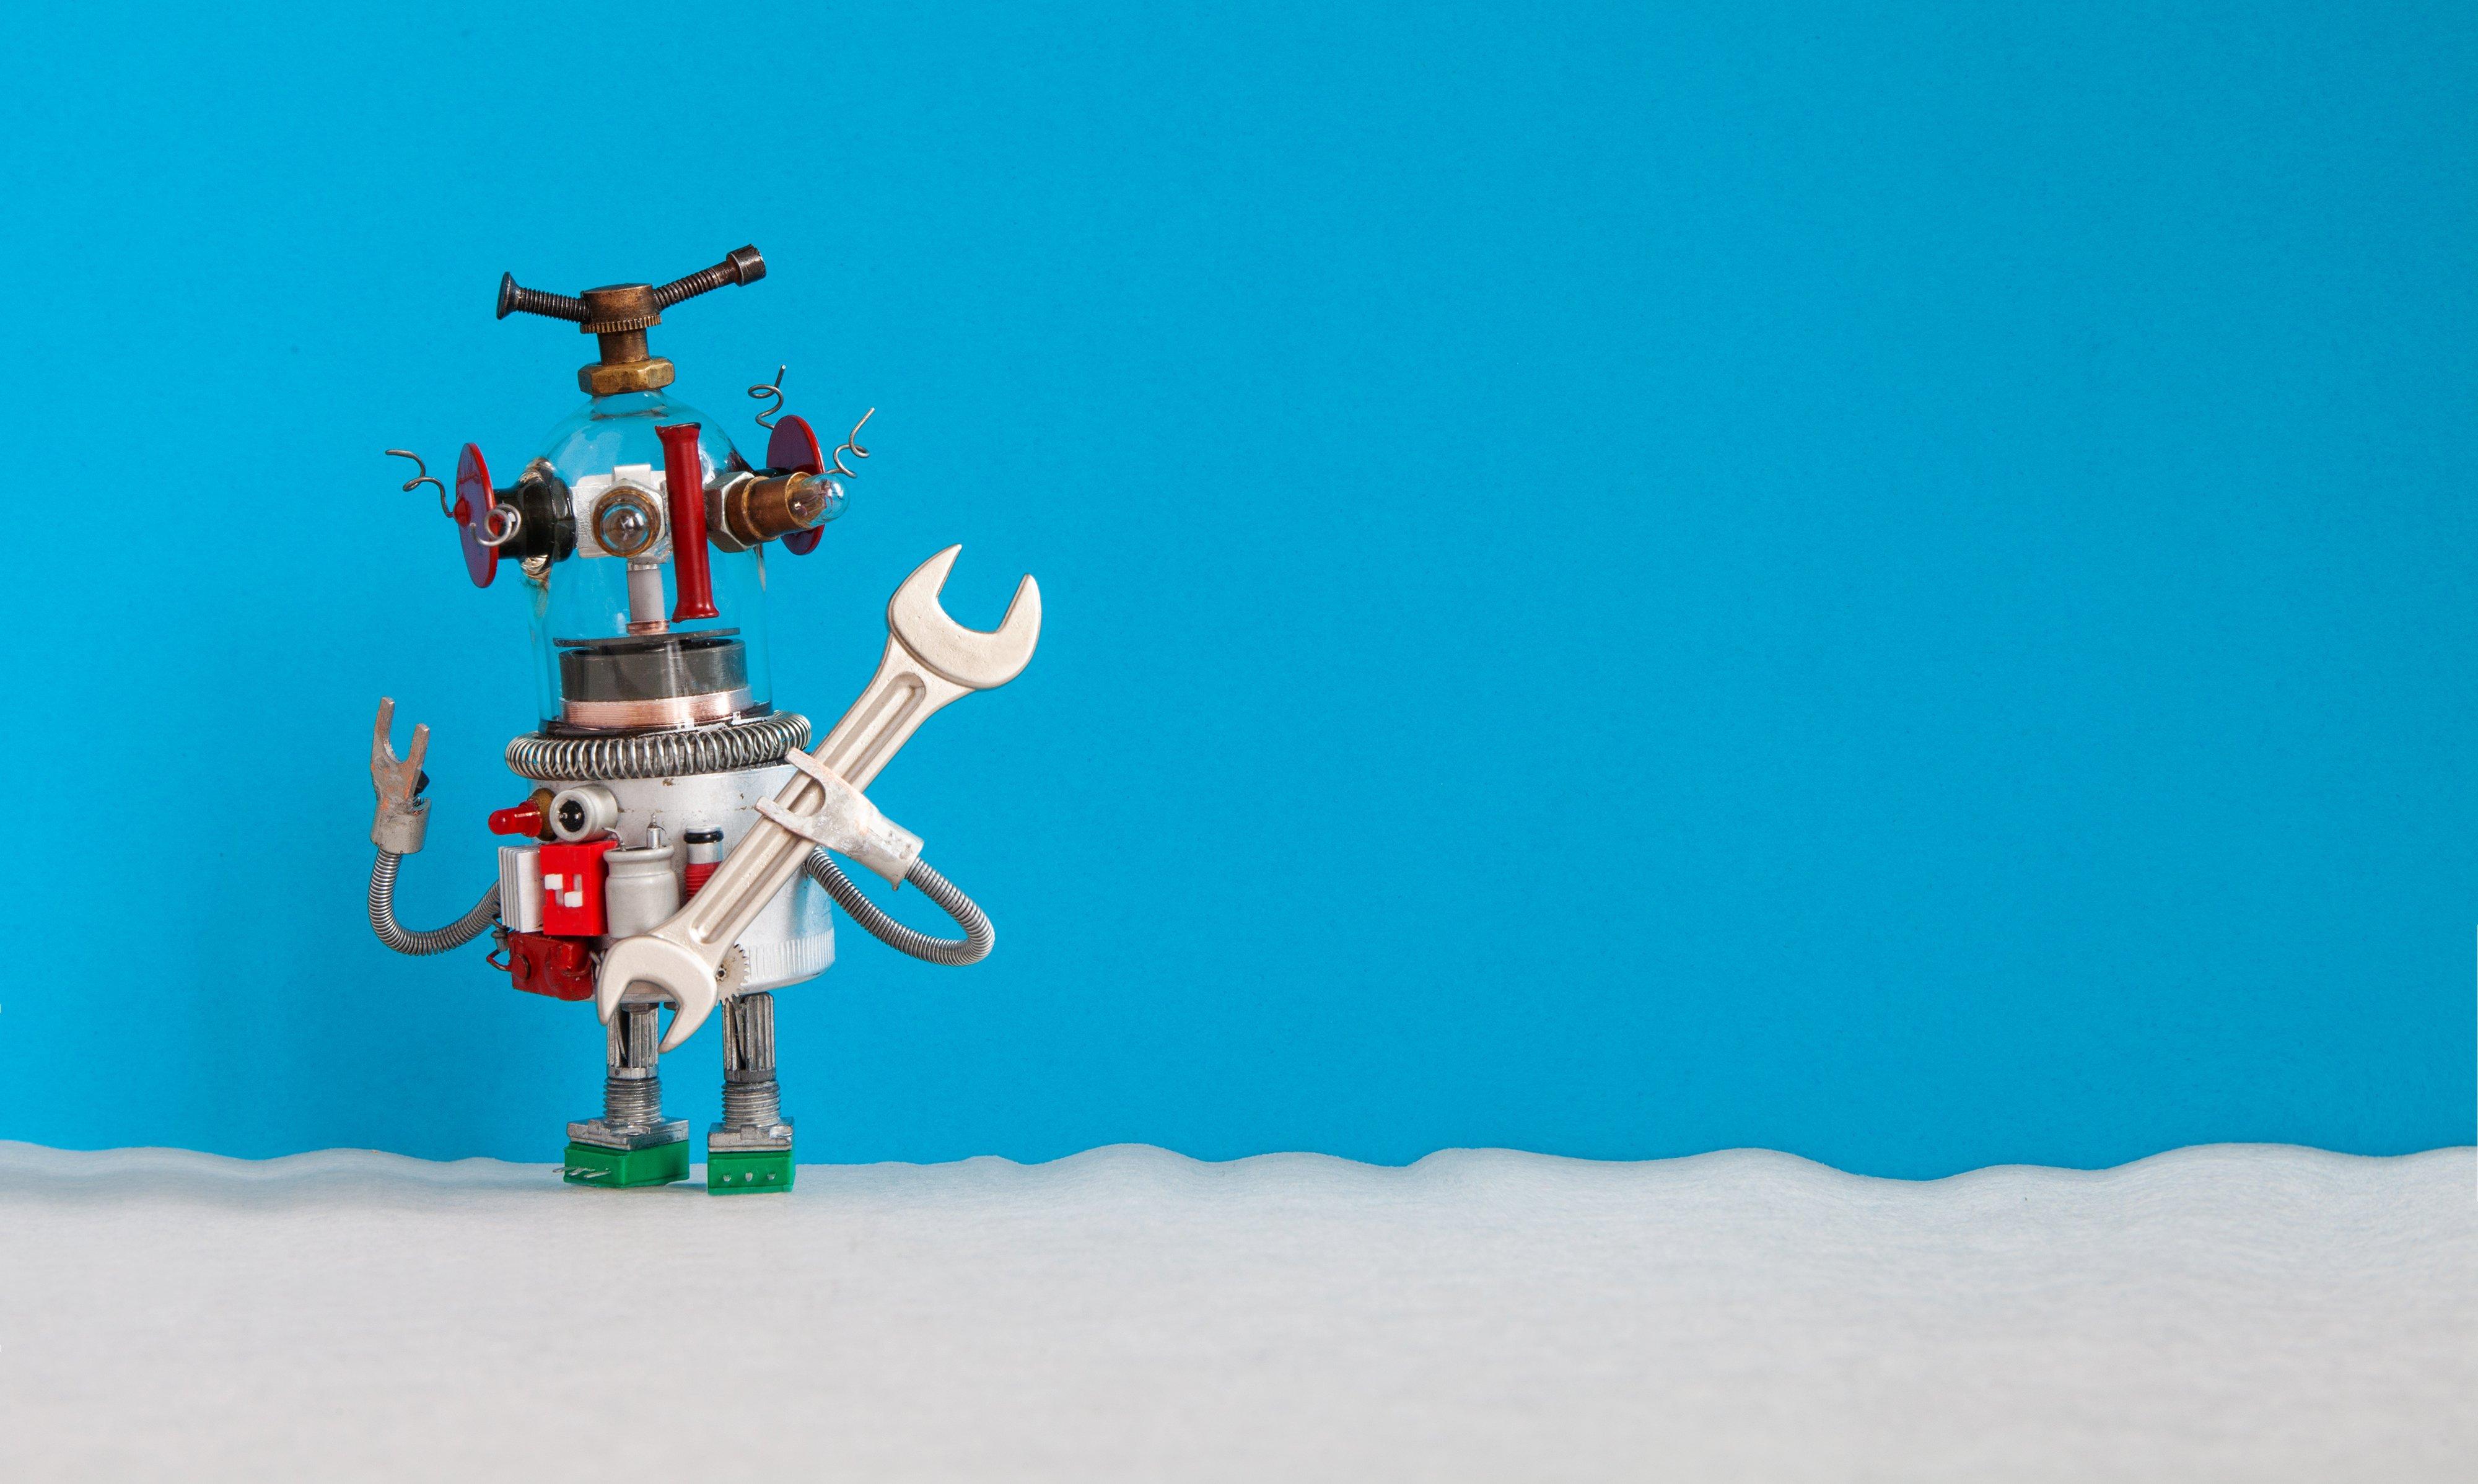 maintenance-service-concept-funny-electrician-robo-JPQL43S